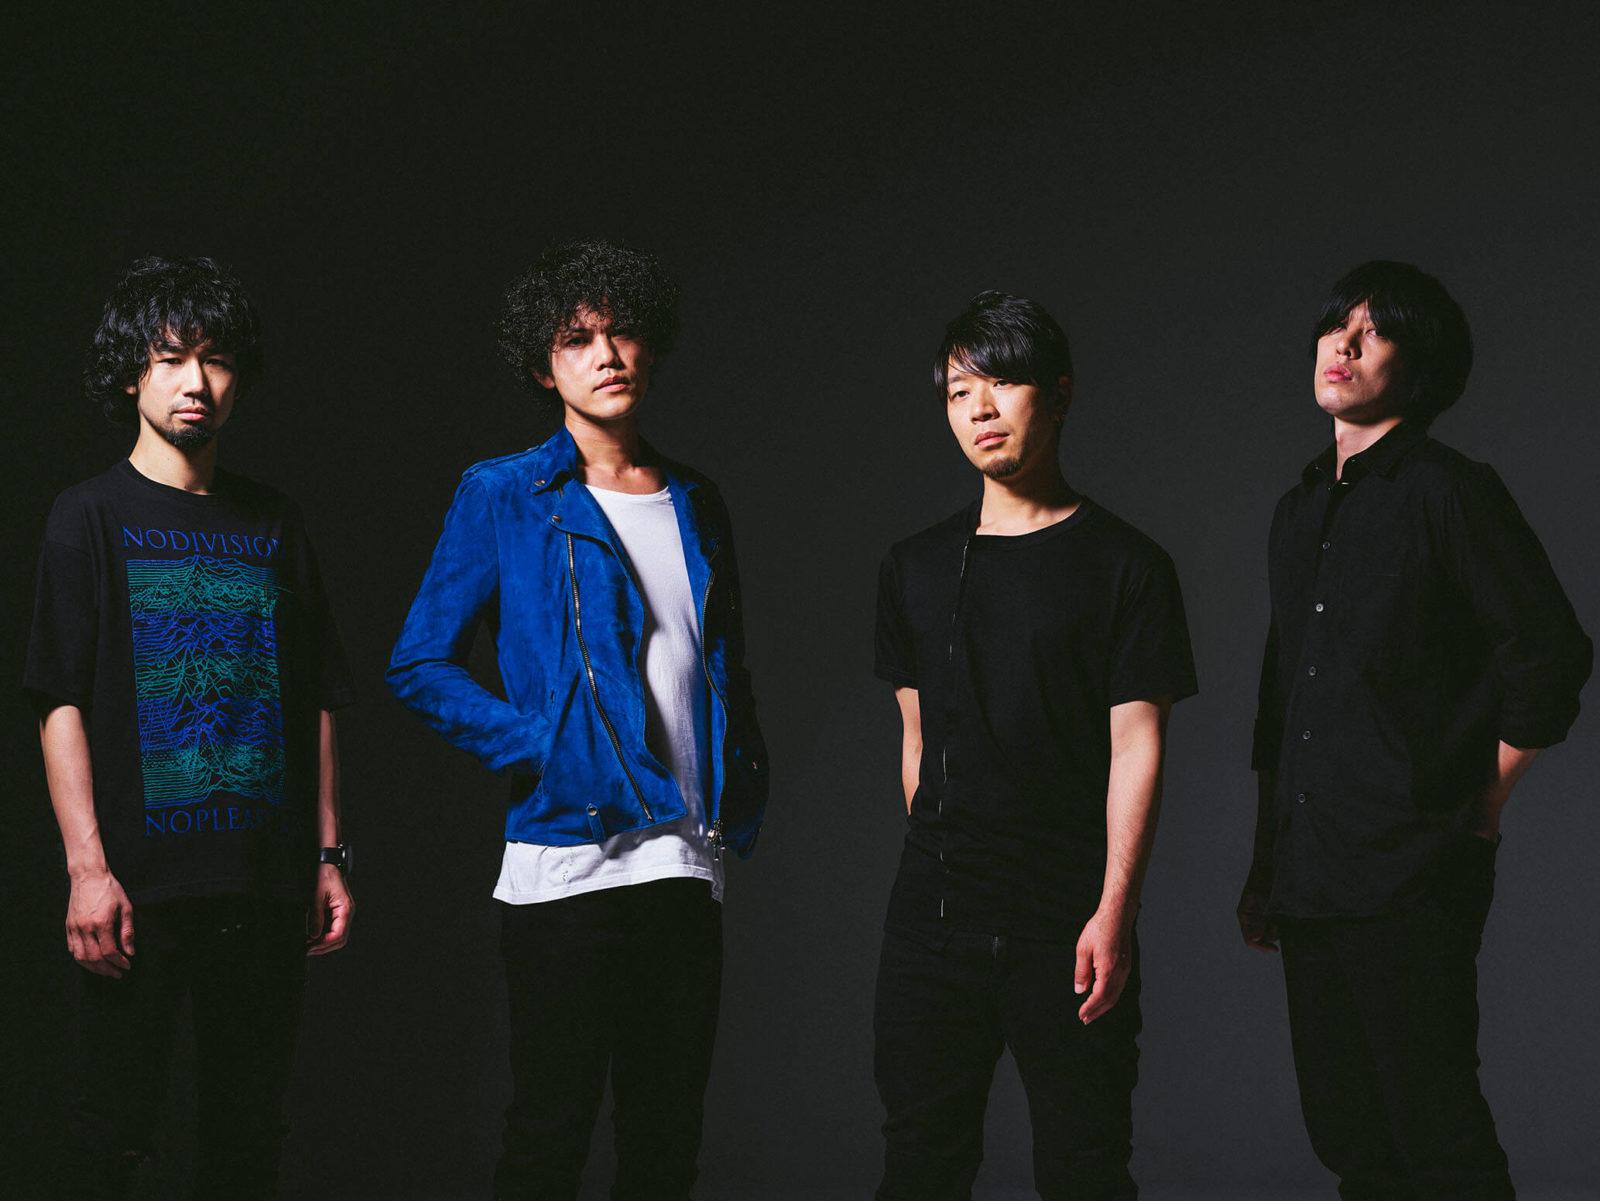 9mm Parabellum Bullet、ミュージックビデオ解禁&LINE LIVE配信決定サムネイル画像